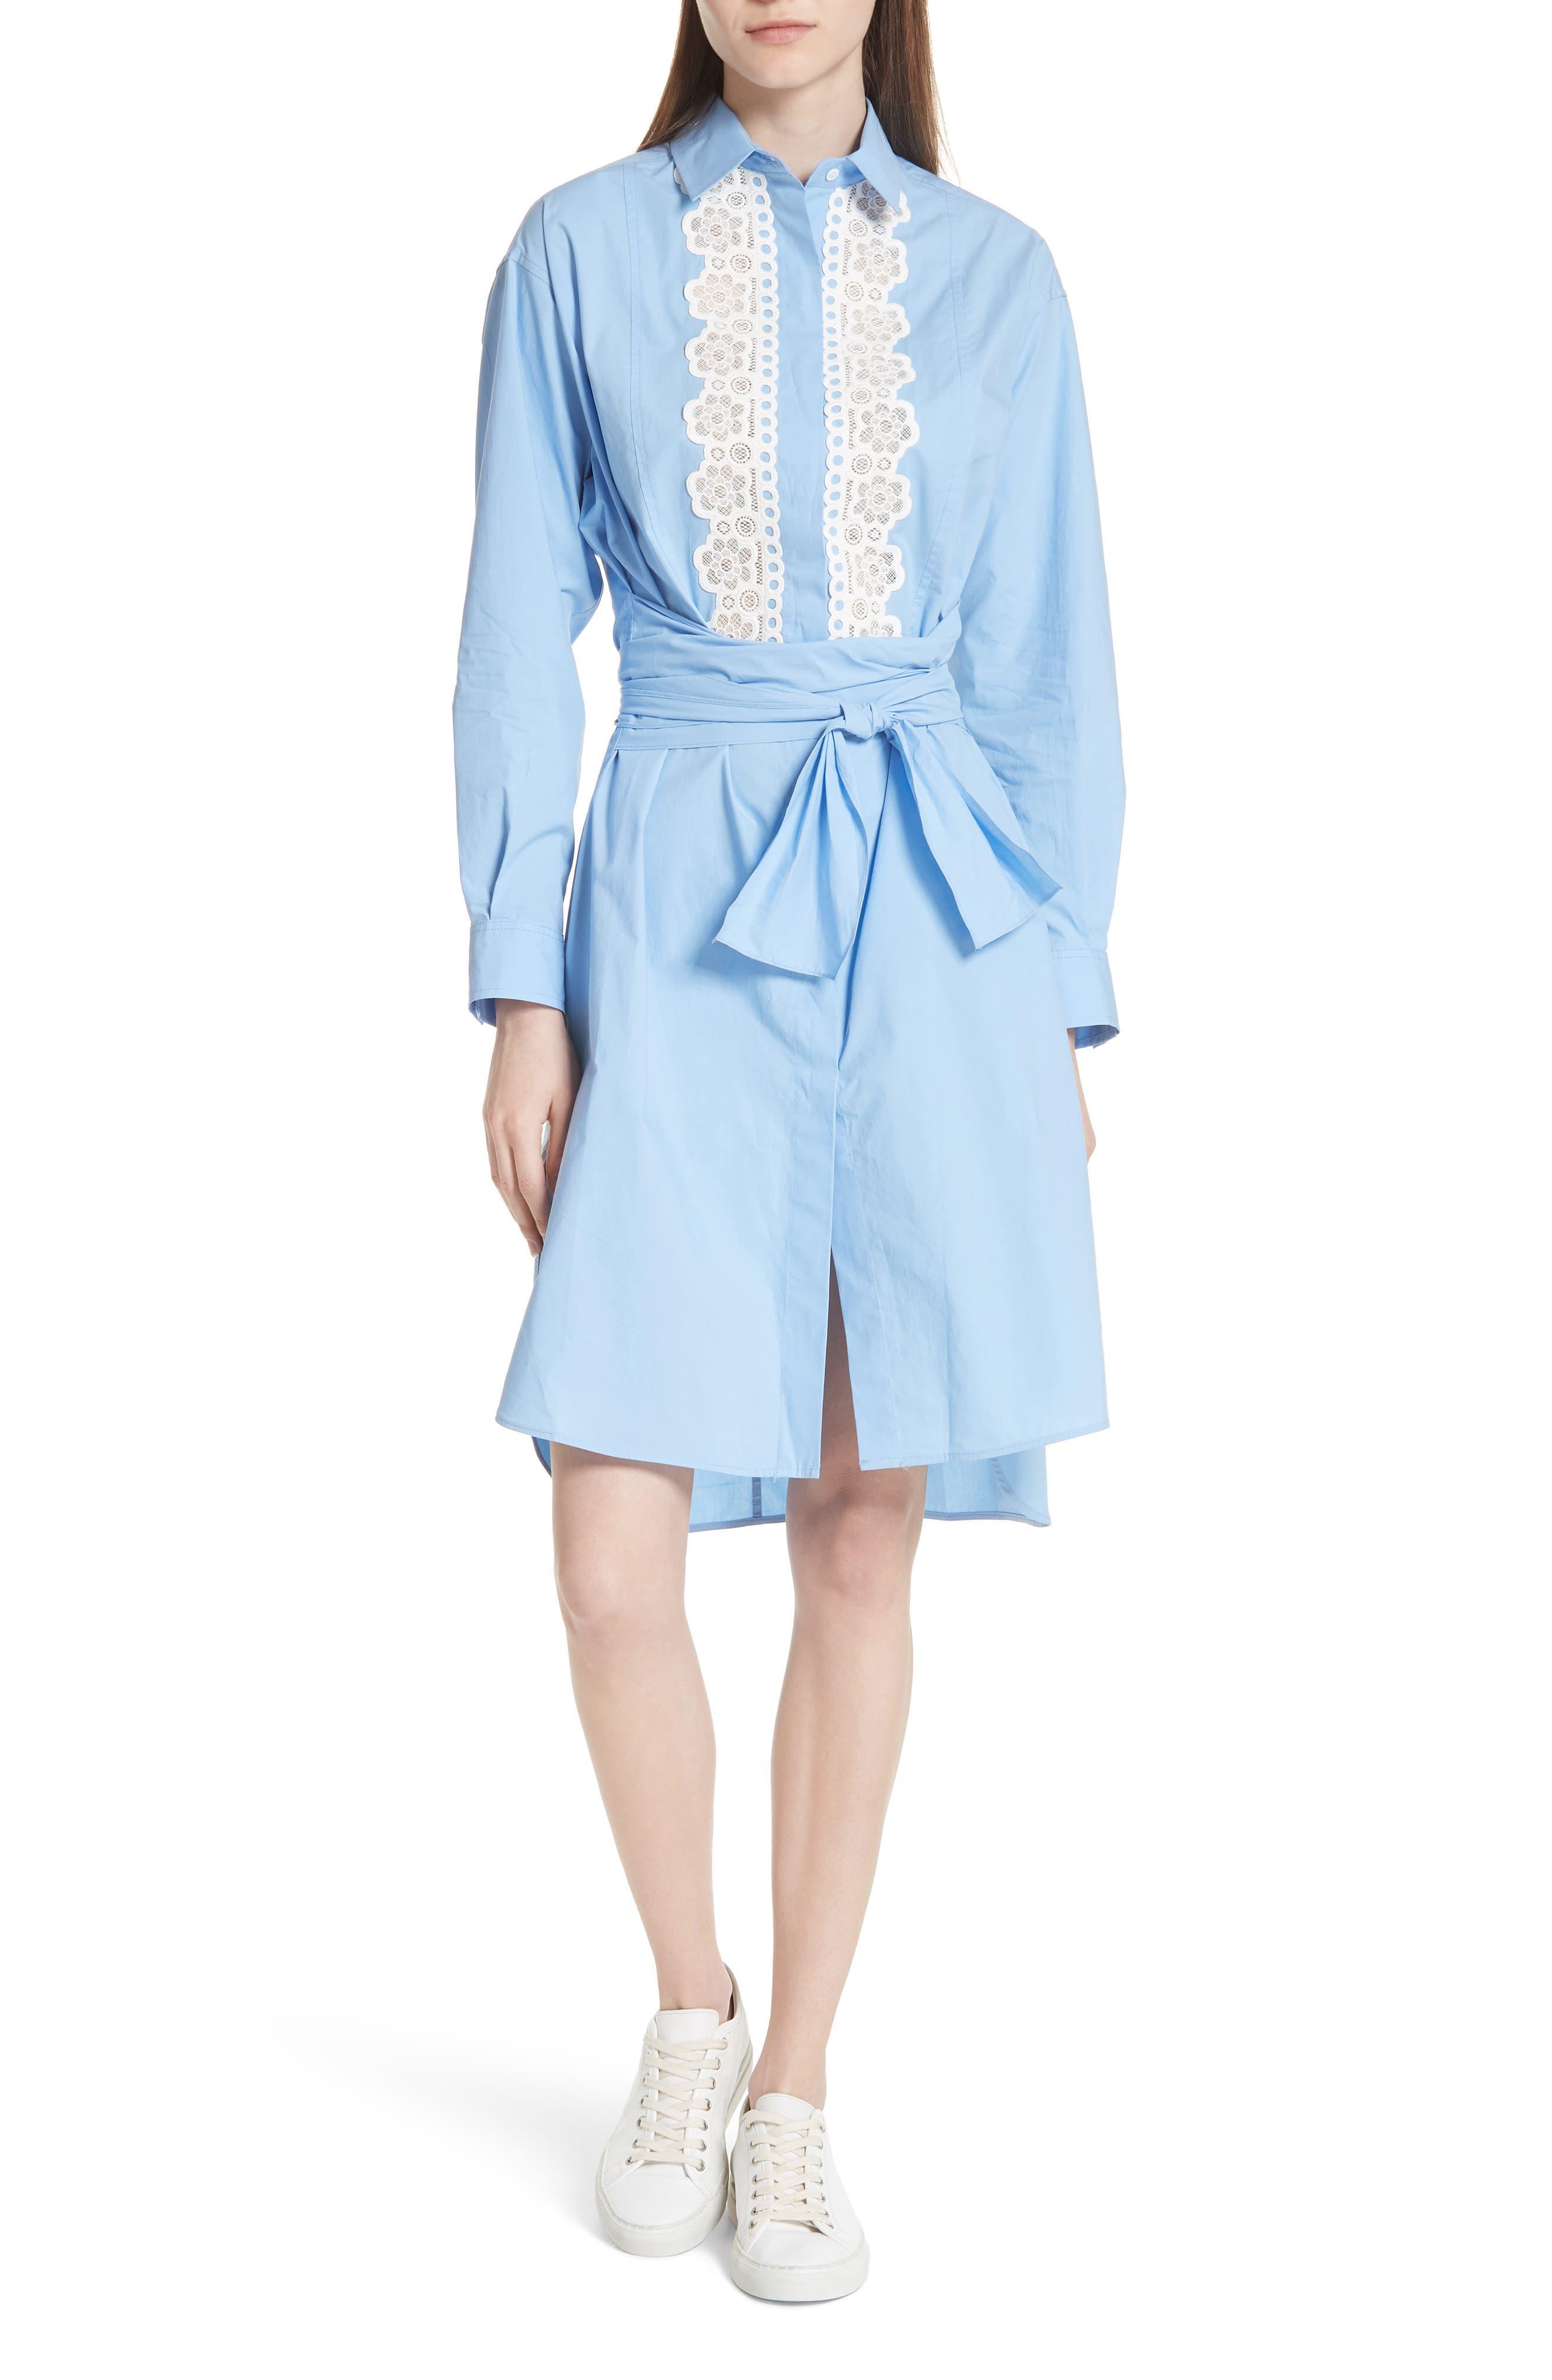 Bleu Ciel Cotton Shirtdress,                         Main,                         color, Sky Blue